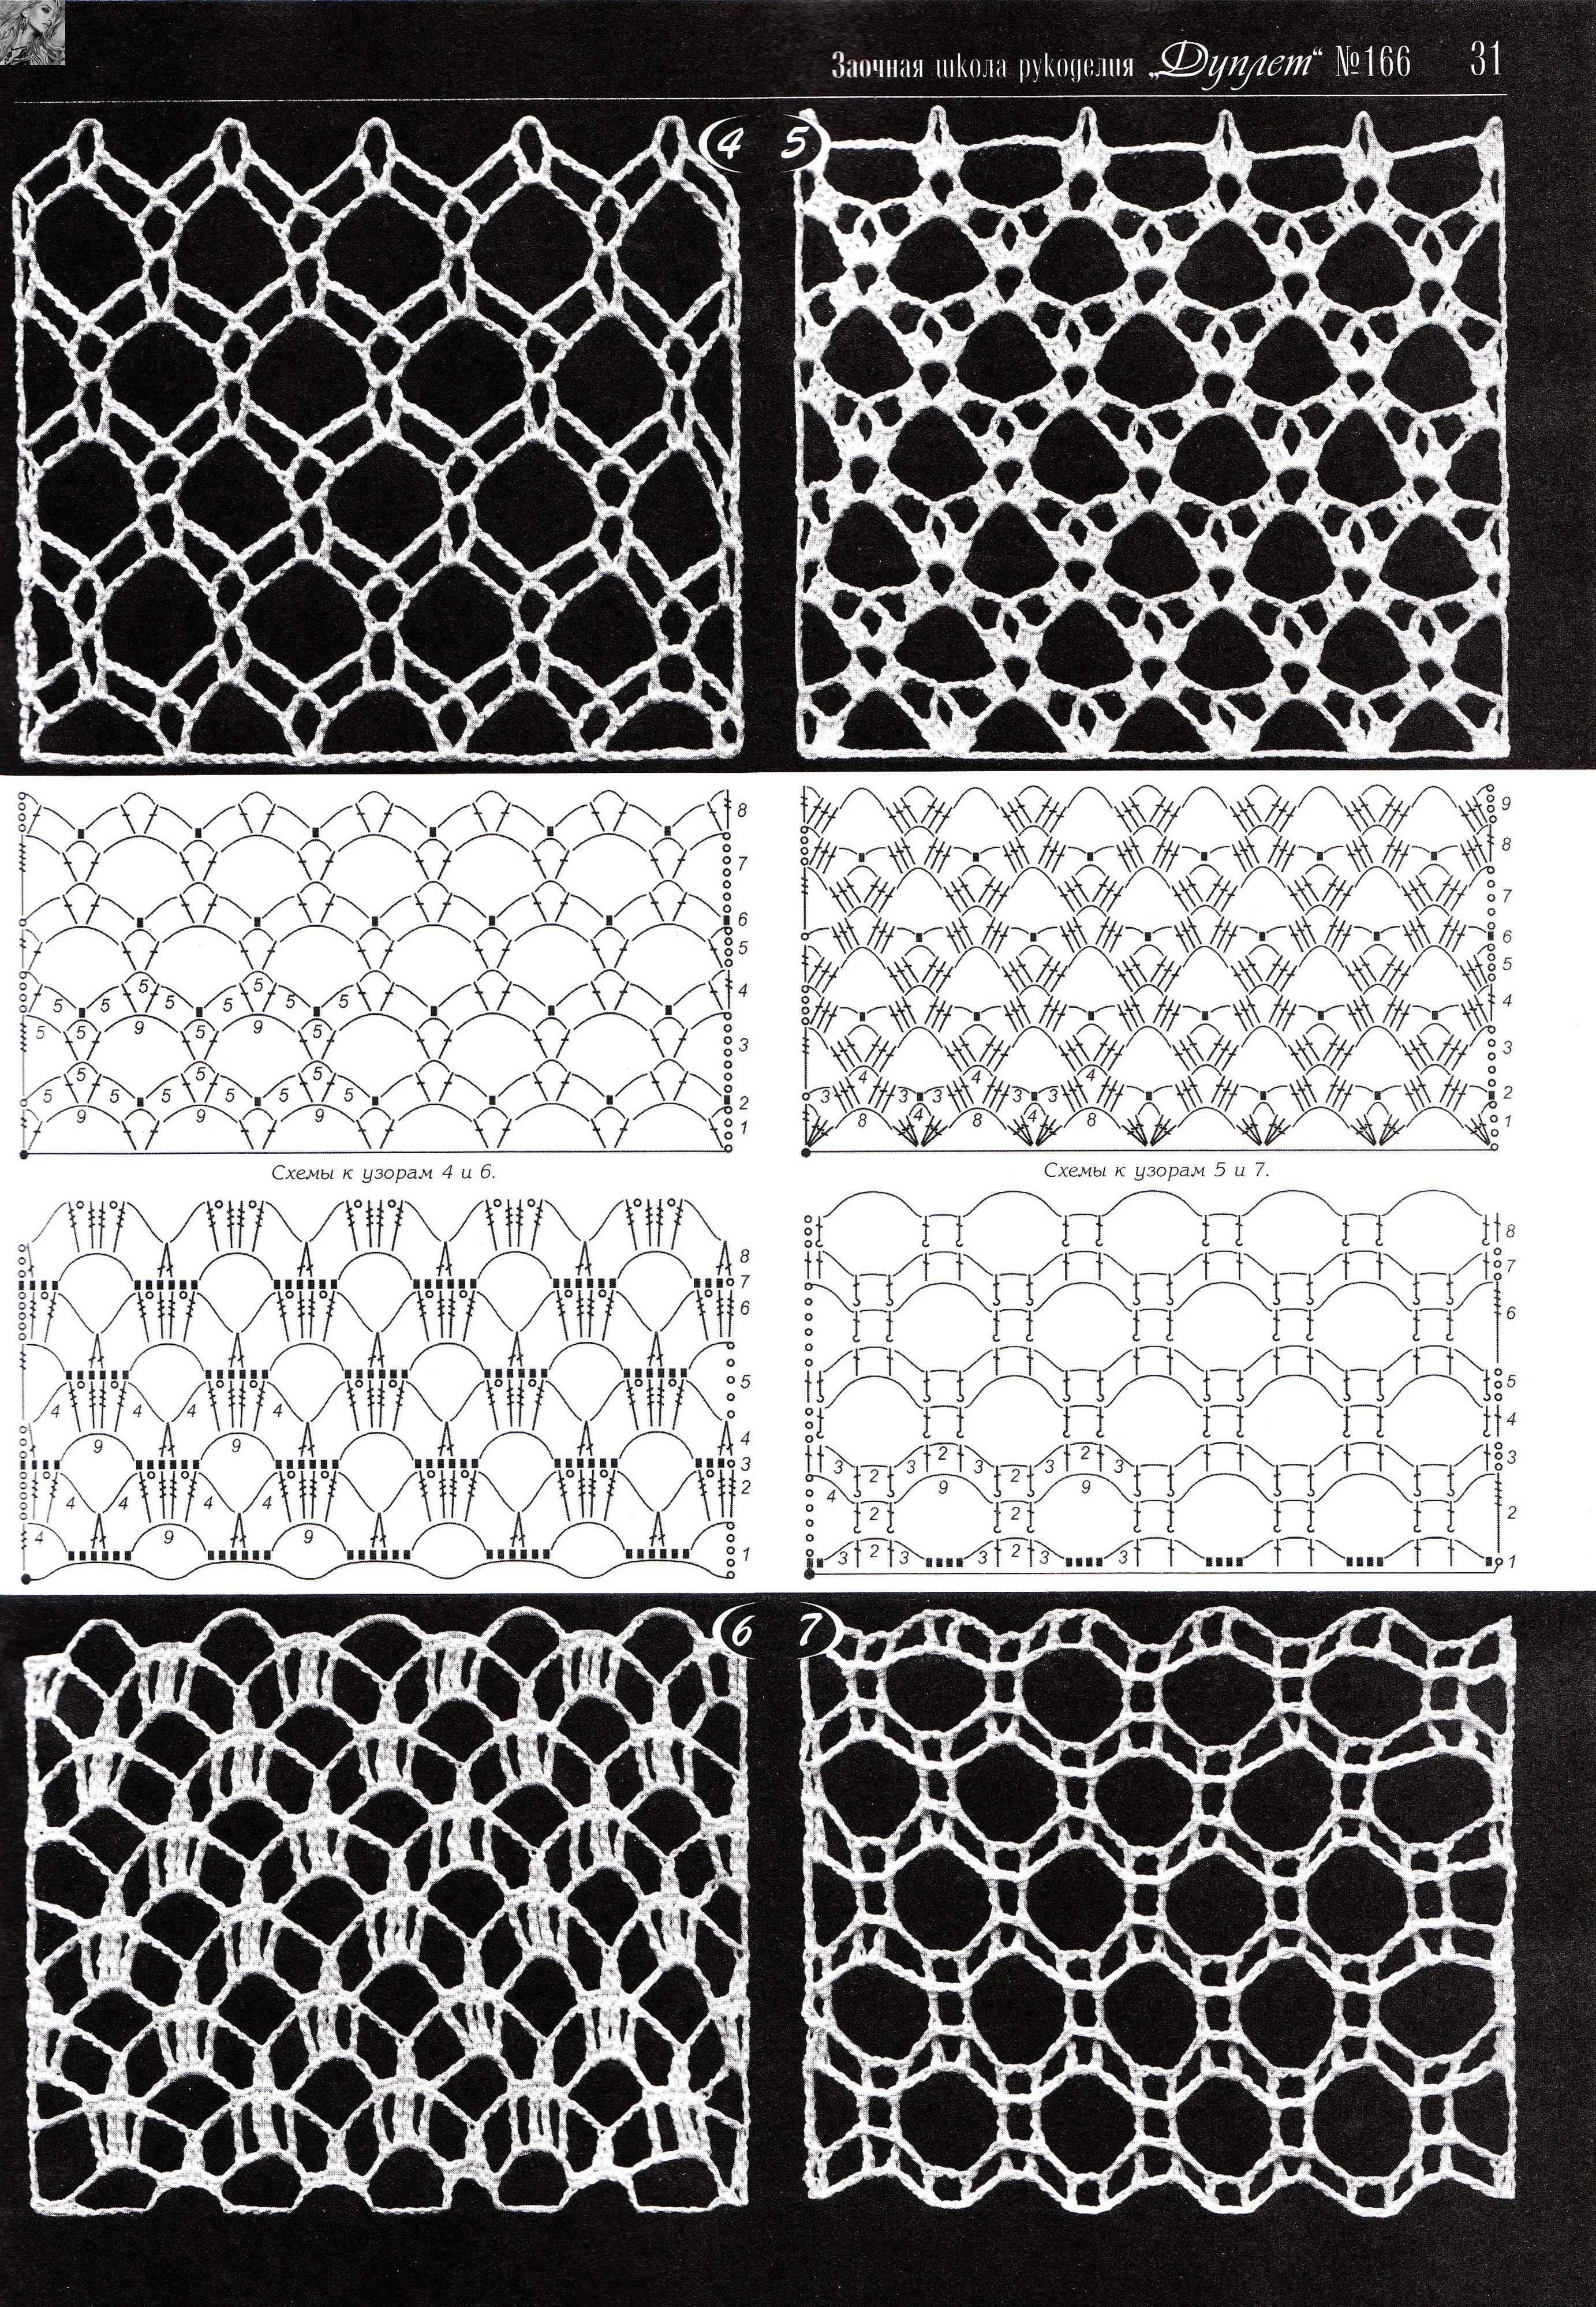 IMG_0041.jpg   Patrones crochet   Pinterest   Crochet ruso, Rusas y ...